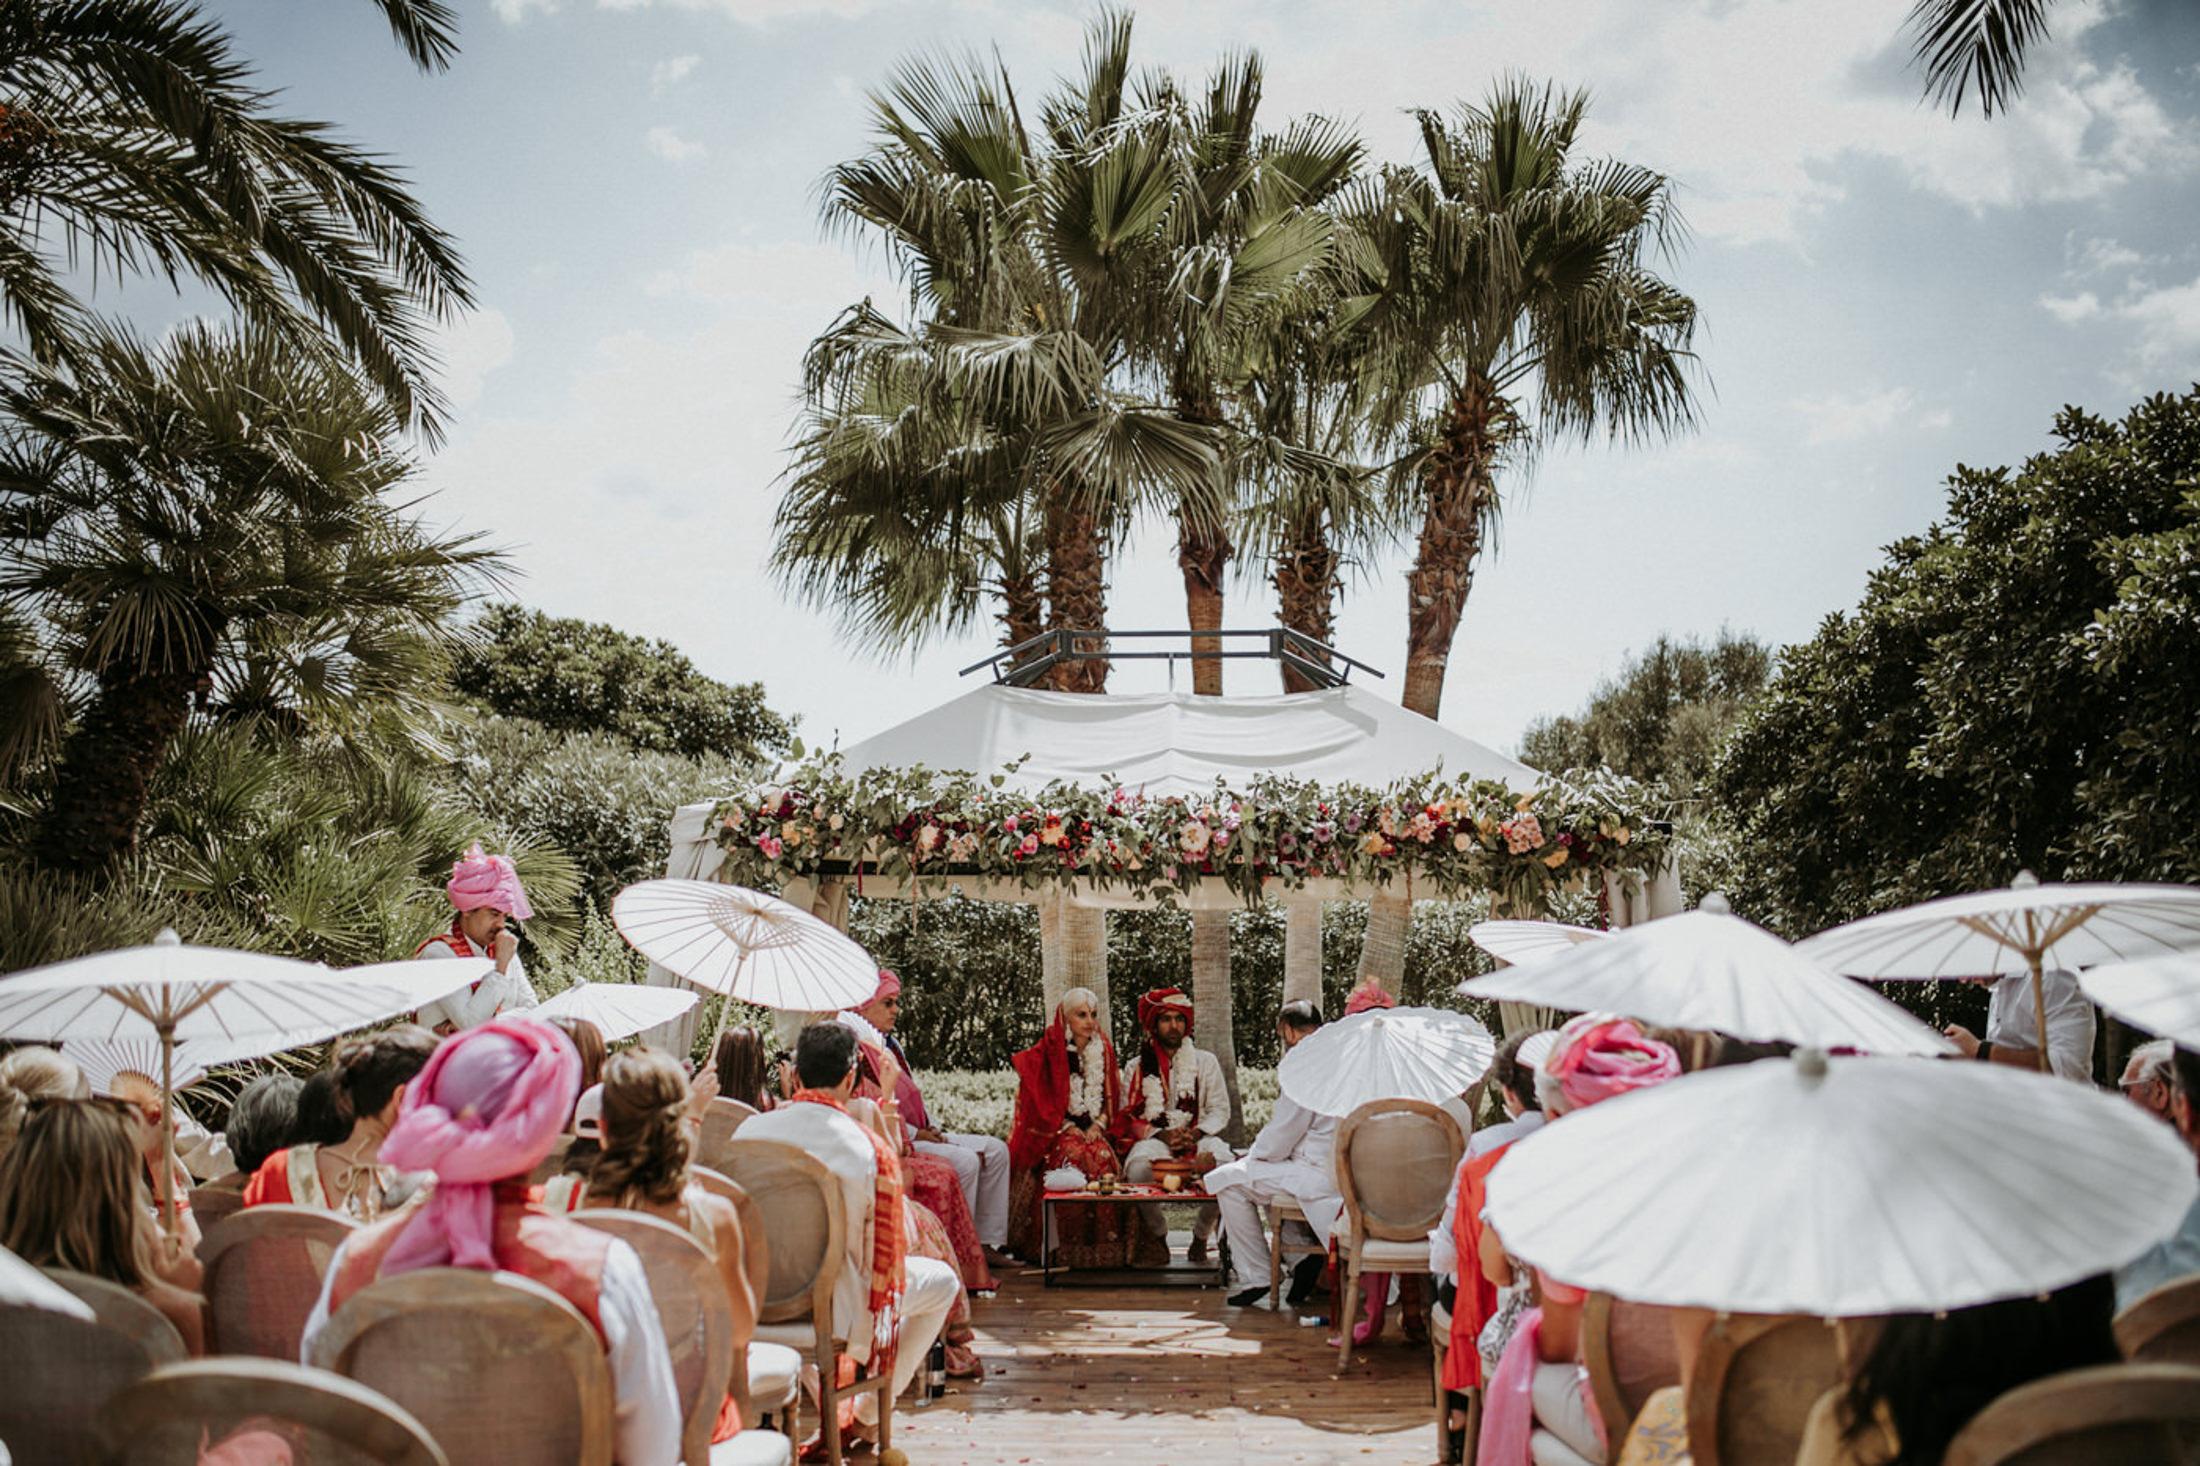 Wedding_Photographer_Mallorca_Daniela-Marquardt_Photography_New_York_Iceland_Tuscany_Santorini_Portugal_Austria_Bavaria_Elopement_Hochzeitsfotograf_AntjeRajat2_48